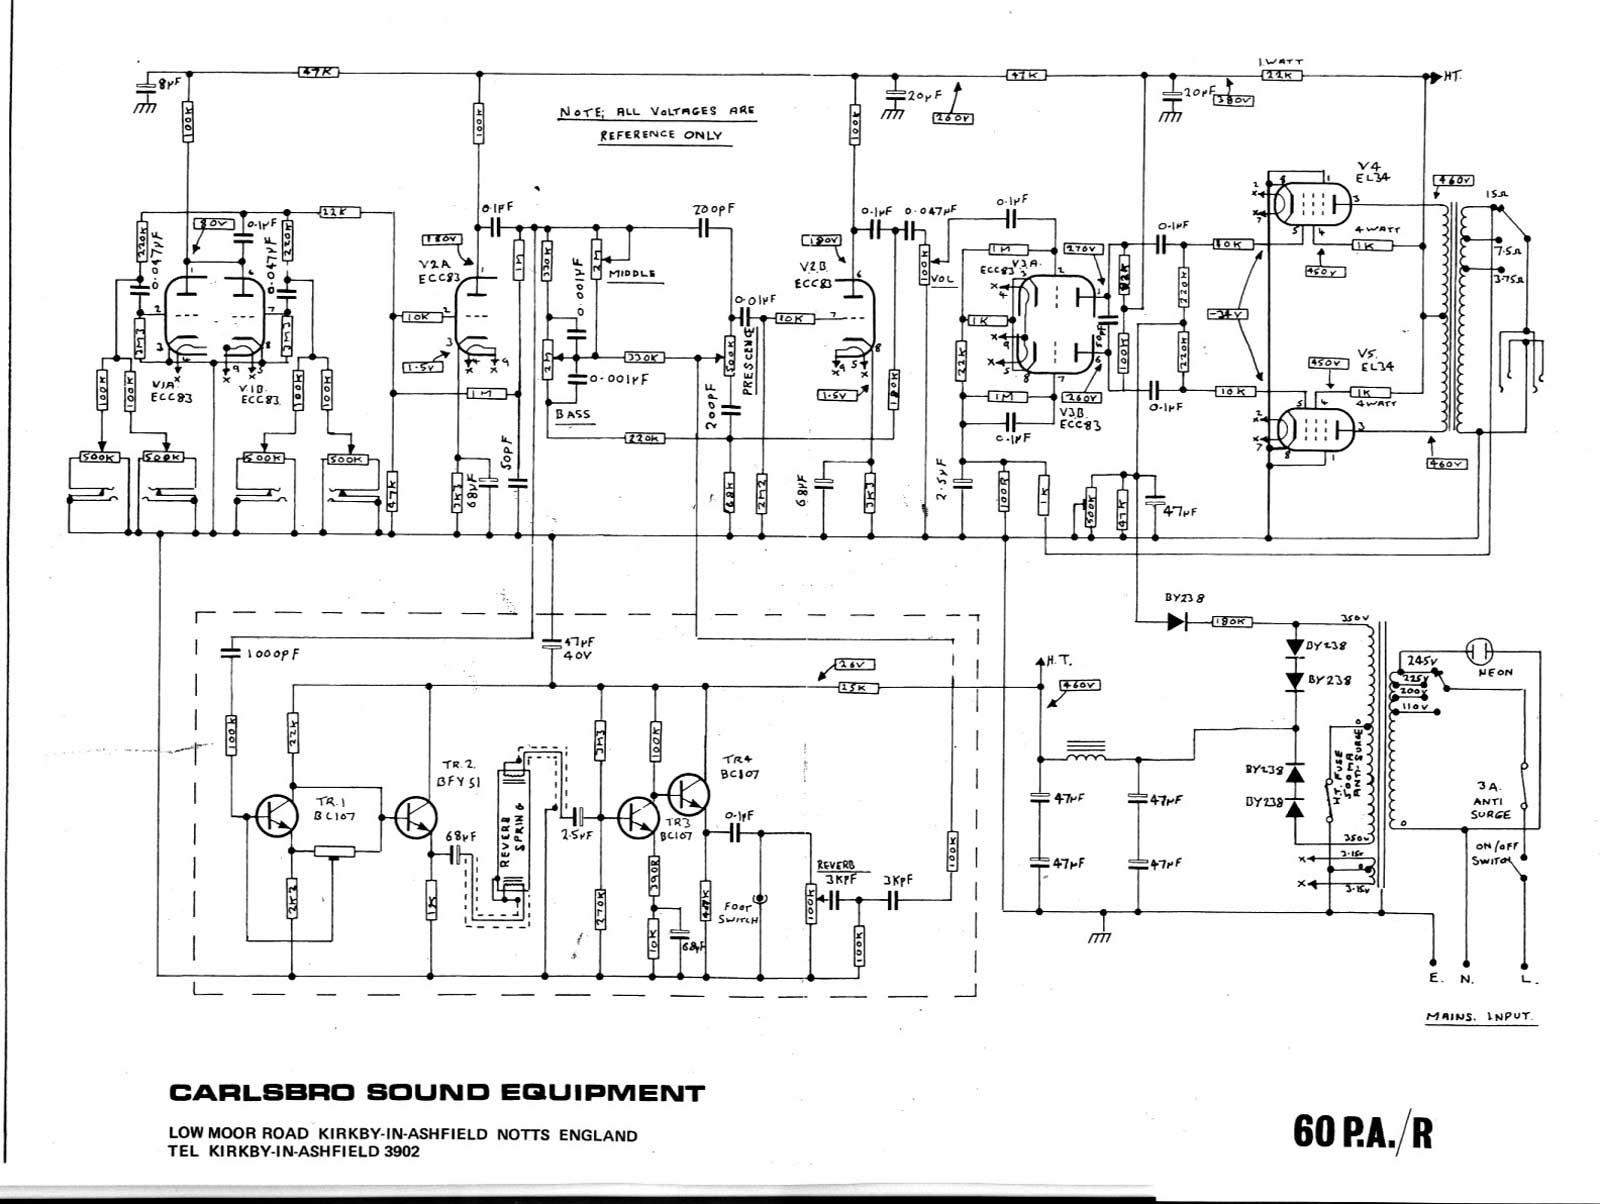 skytec starter wiring diagram Download-skytec starter wiring diagram Download Full Size of Wiring Diagram Skytec Starter Wiring Diagram Schematics 4-a